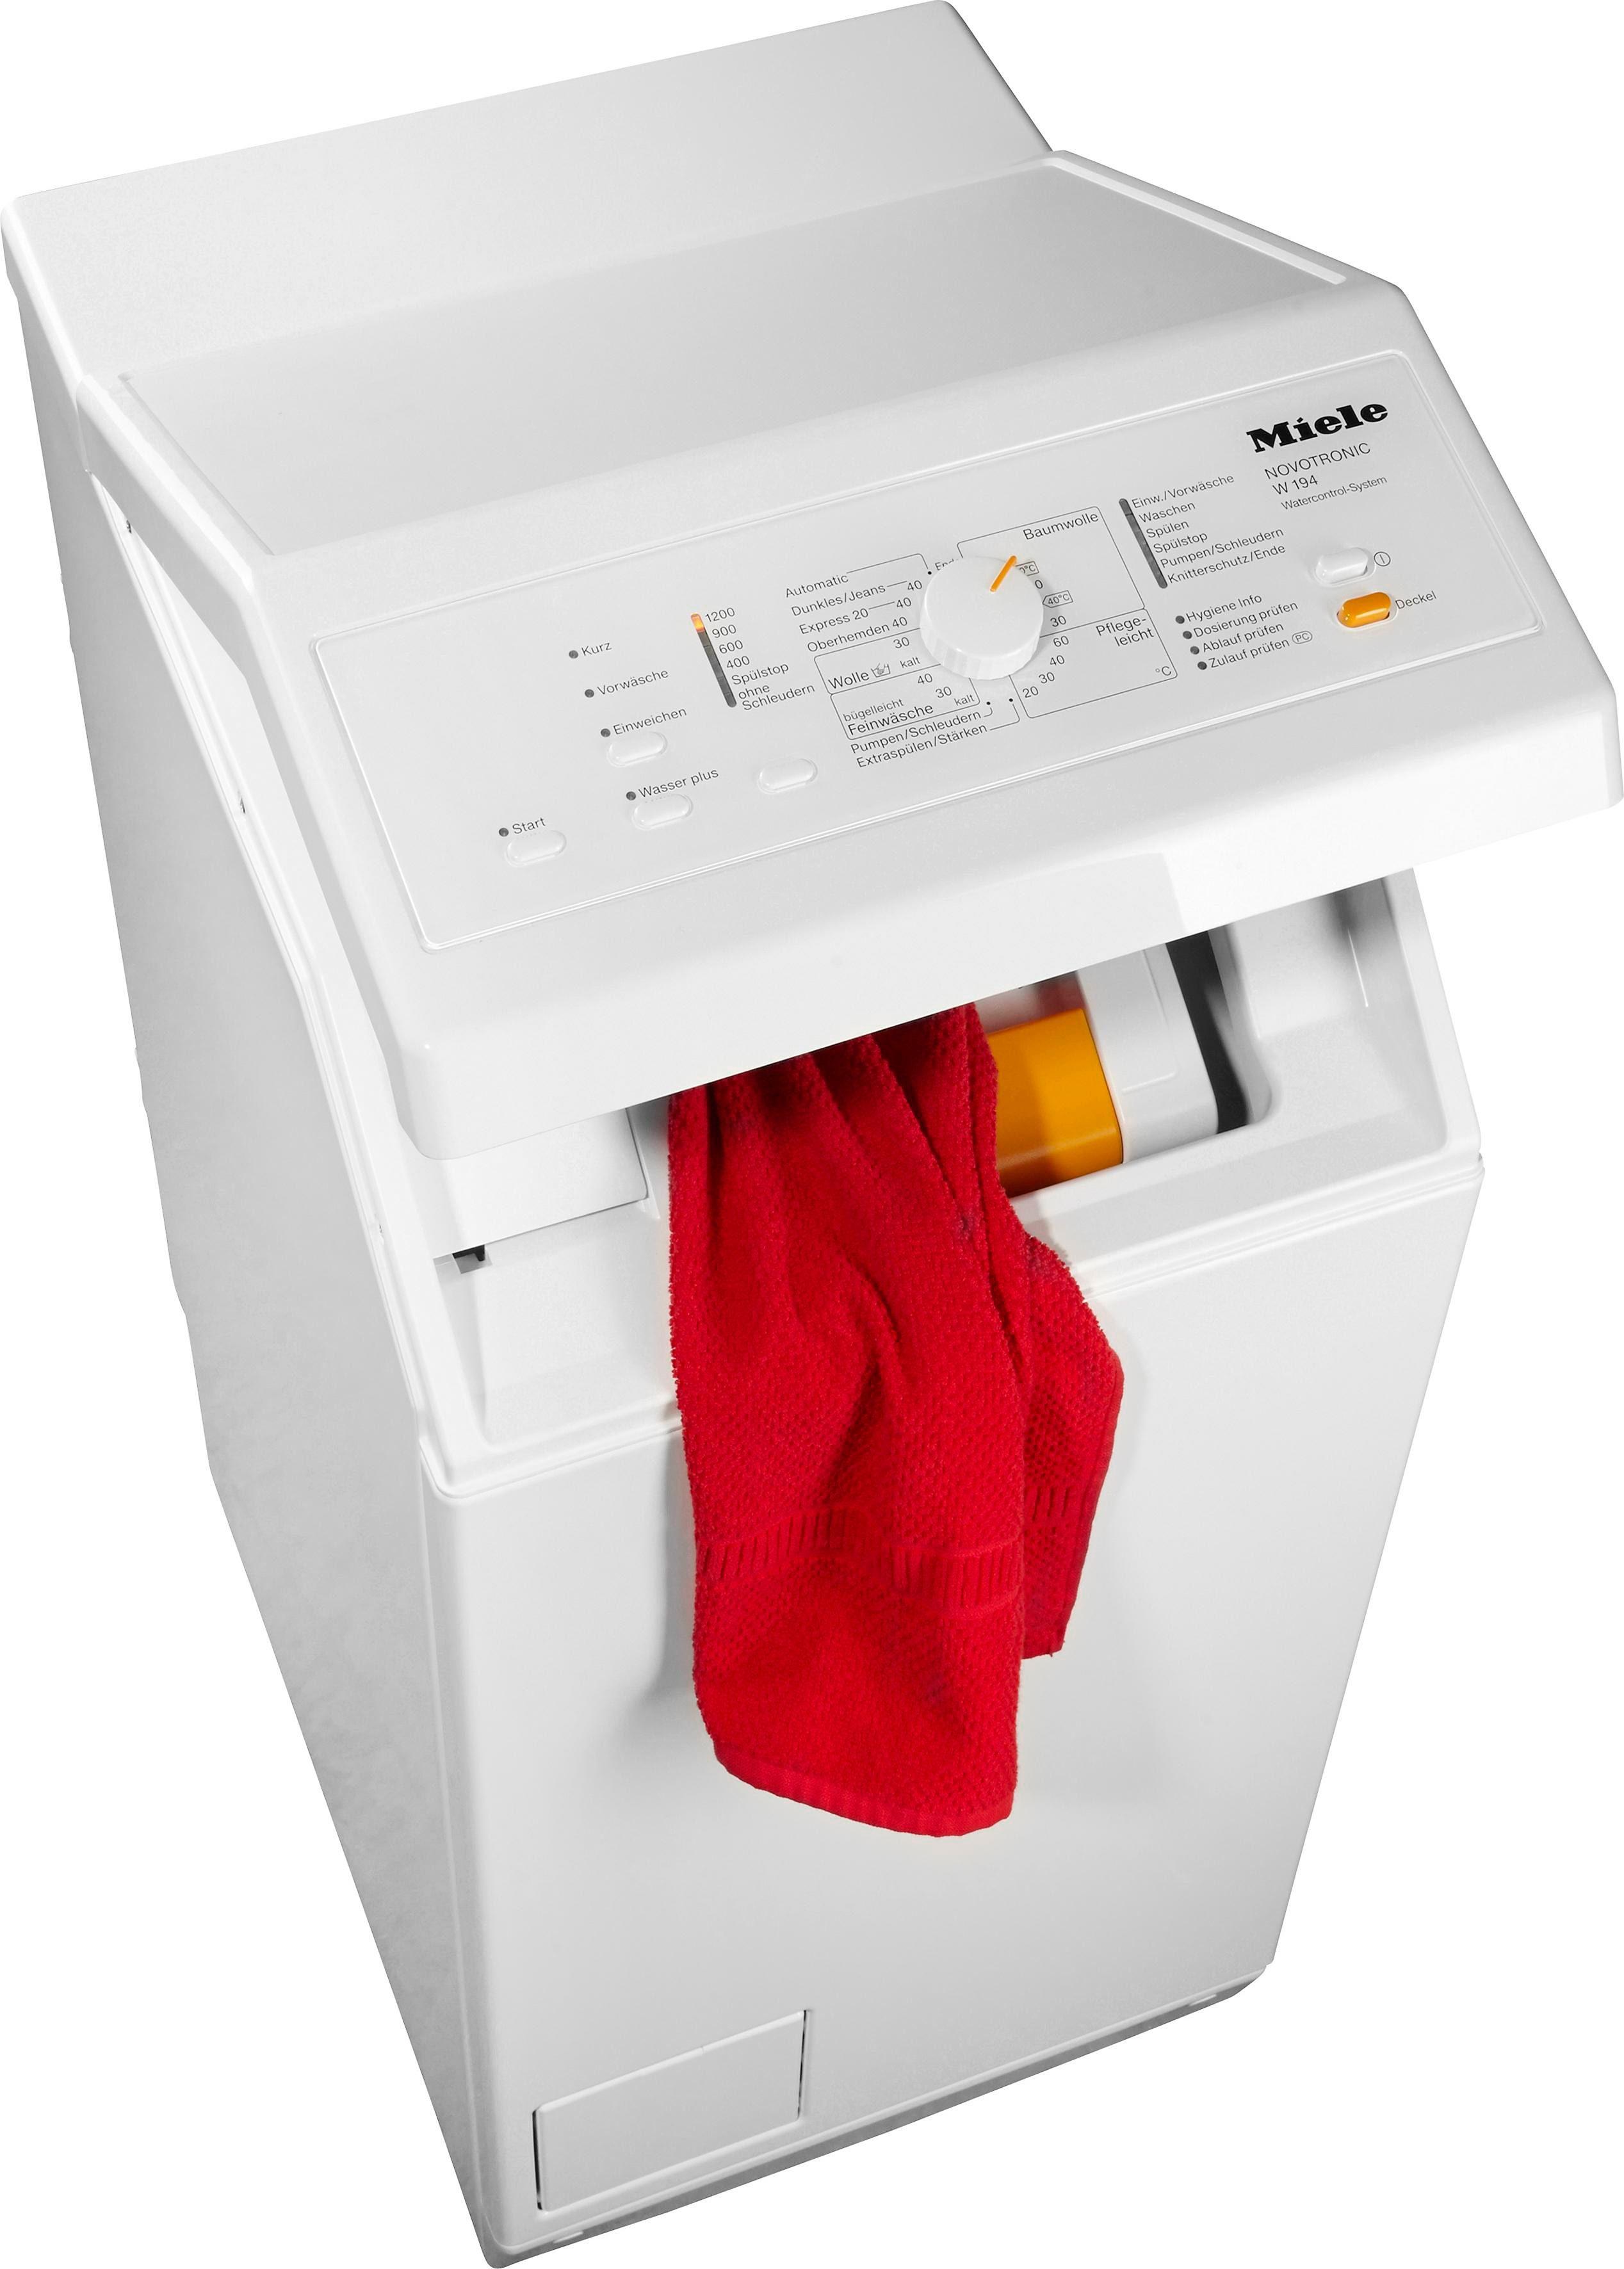 MIELE Waschmaschine Toplader W 194 WCS, A+++, 6 kg, 1200 U/Min